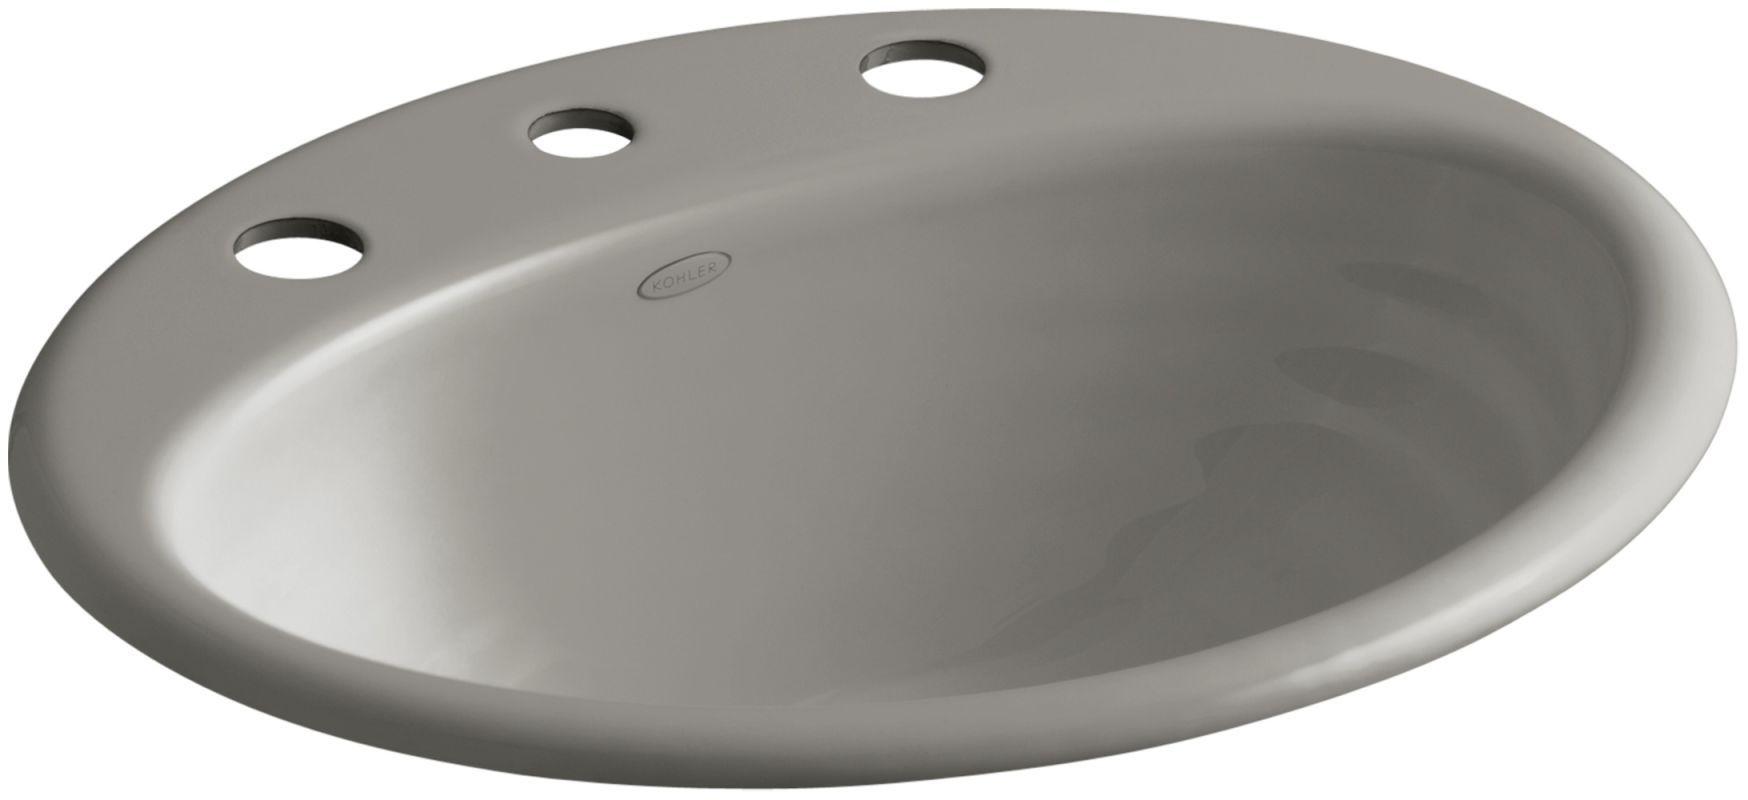 "Kohler K-2906-8 Ellington 16"" Cast Iron Drop In Bathroom Sink with 3 Holes Drill Cashmere Fixture Lavatory Sink Cast Iron"